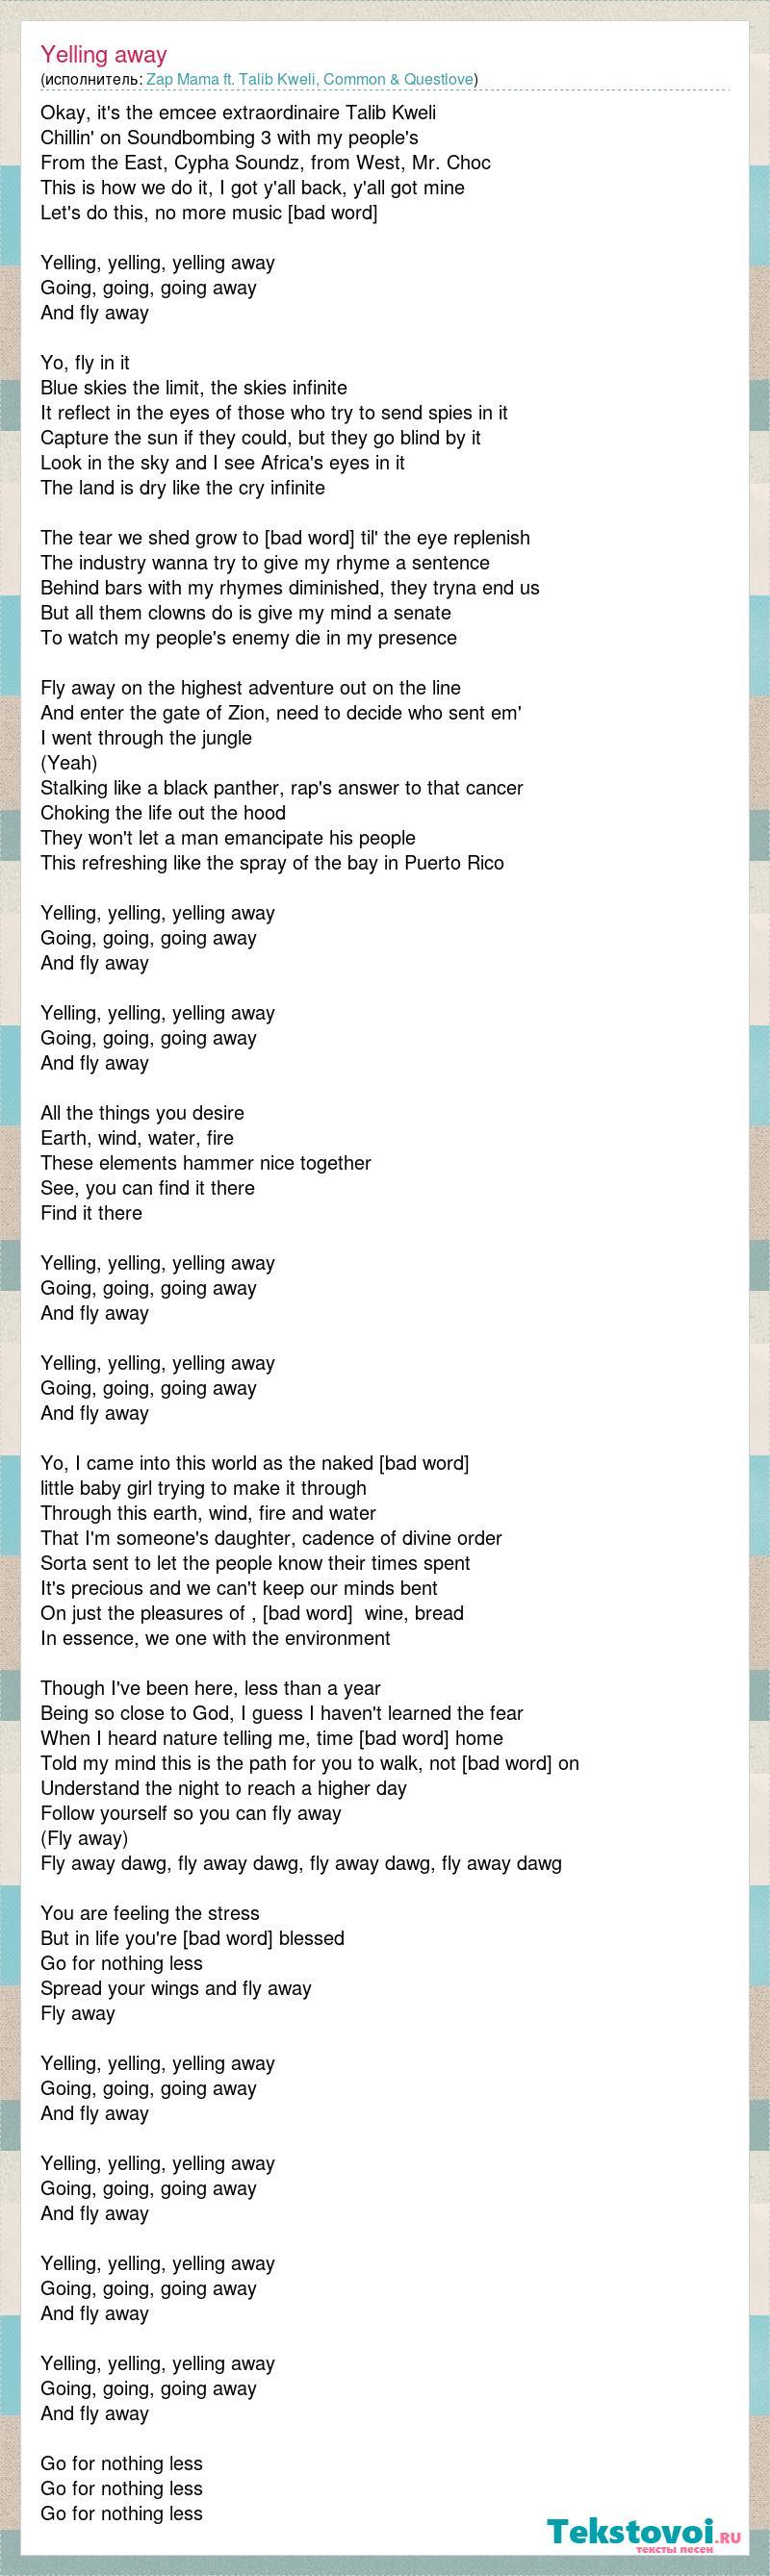 Zap Mama ft  Talib Kweli, Common & Questlove: Yelling away